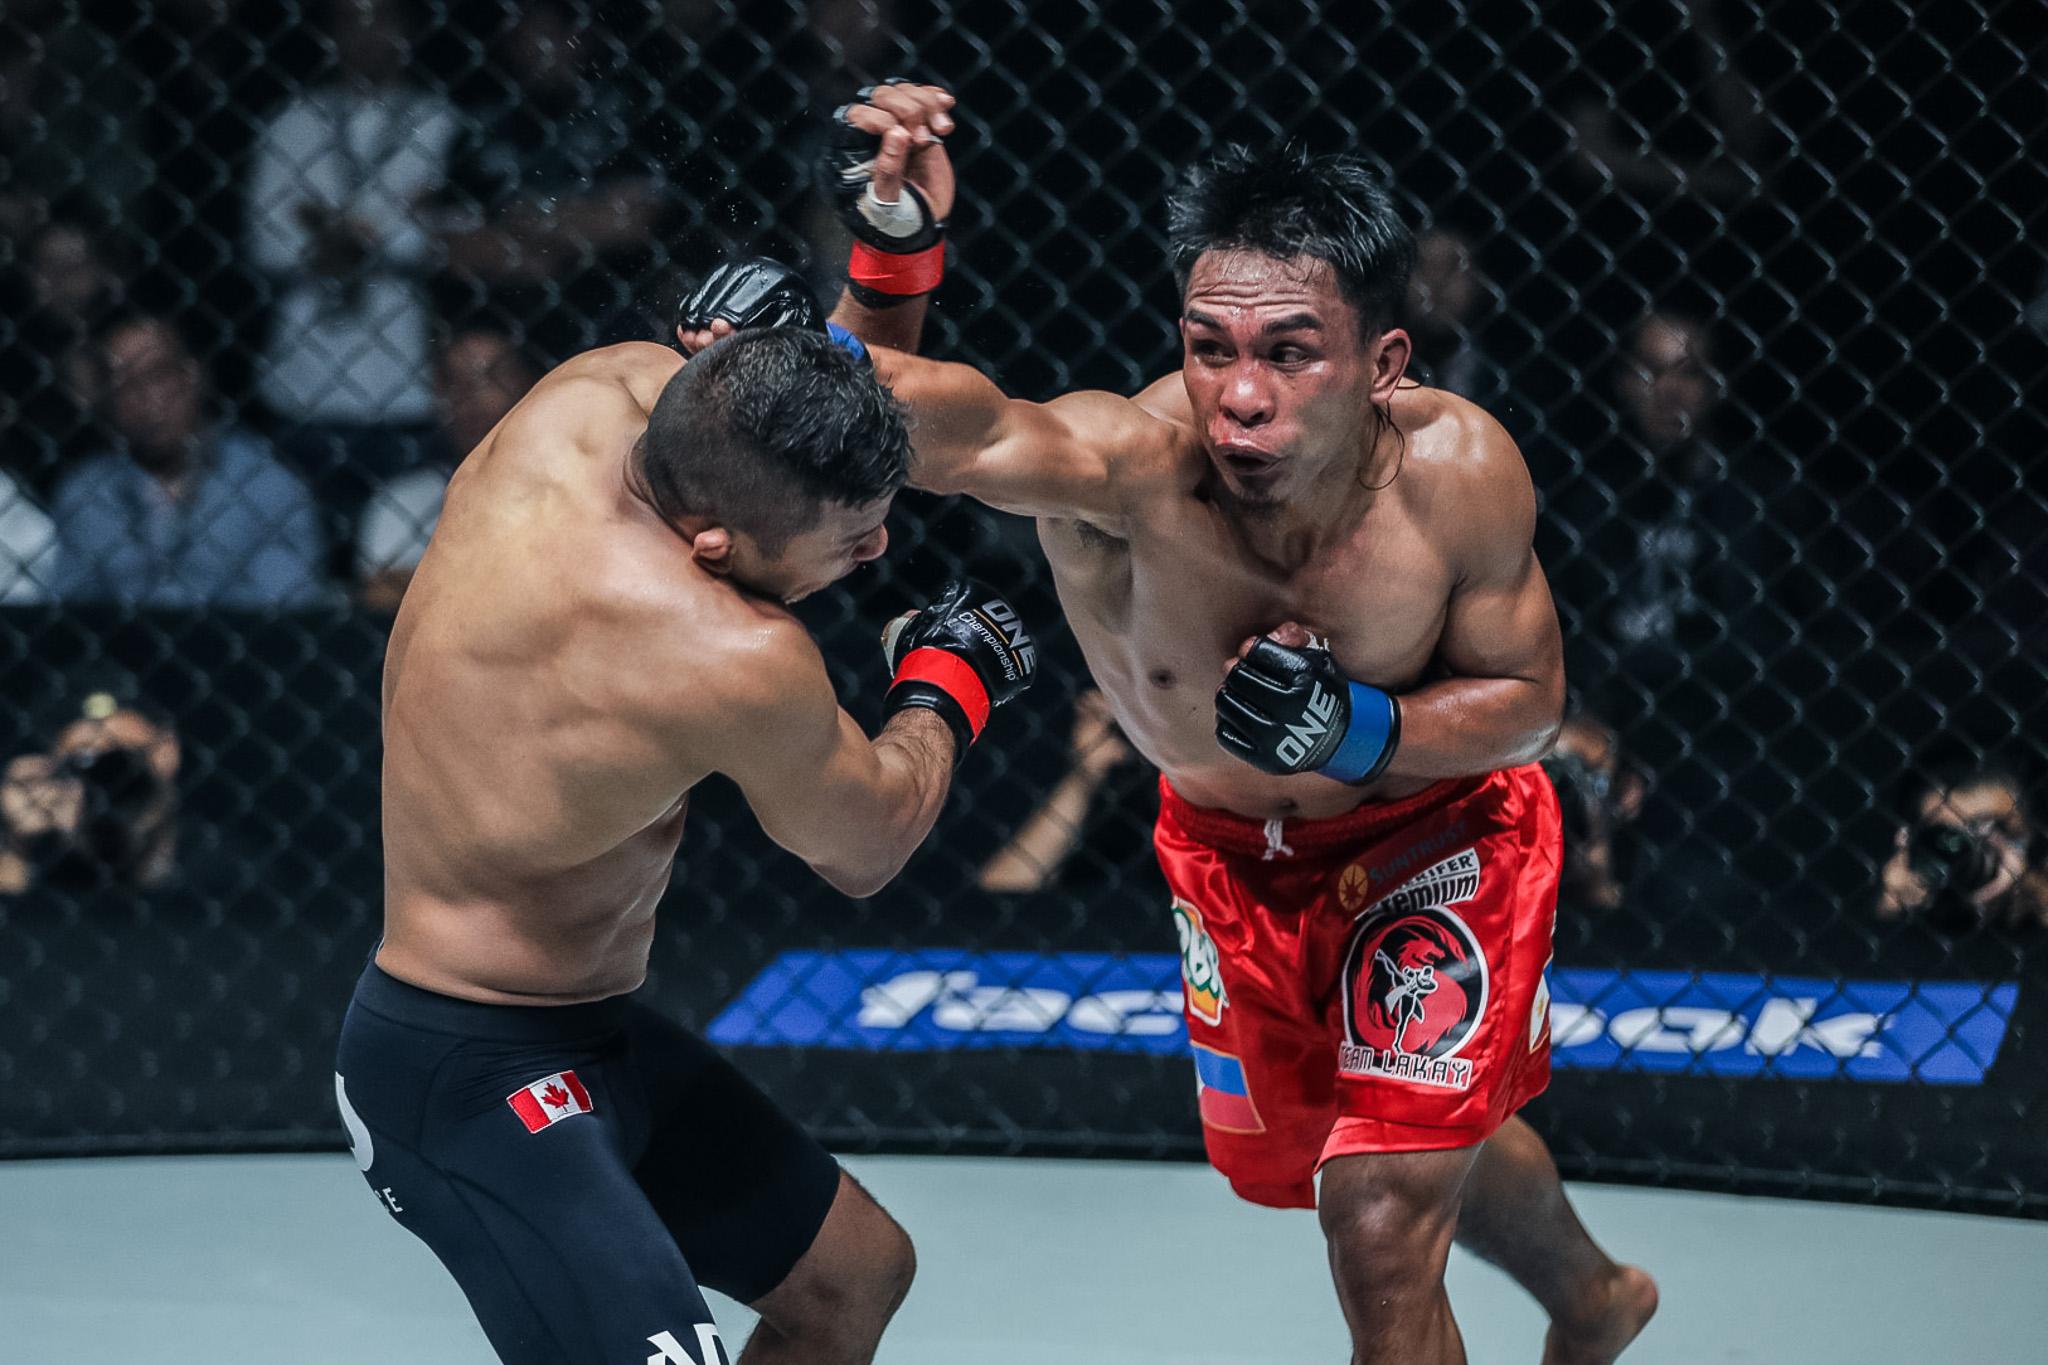 Belingon edges Fernandes to unify ONE Bantamweight title